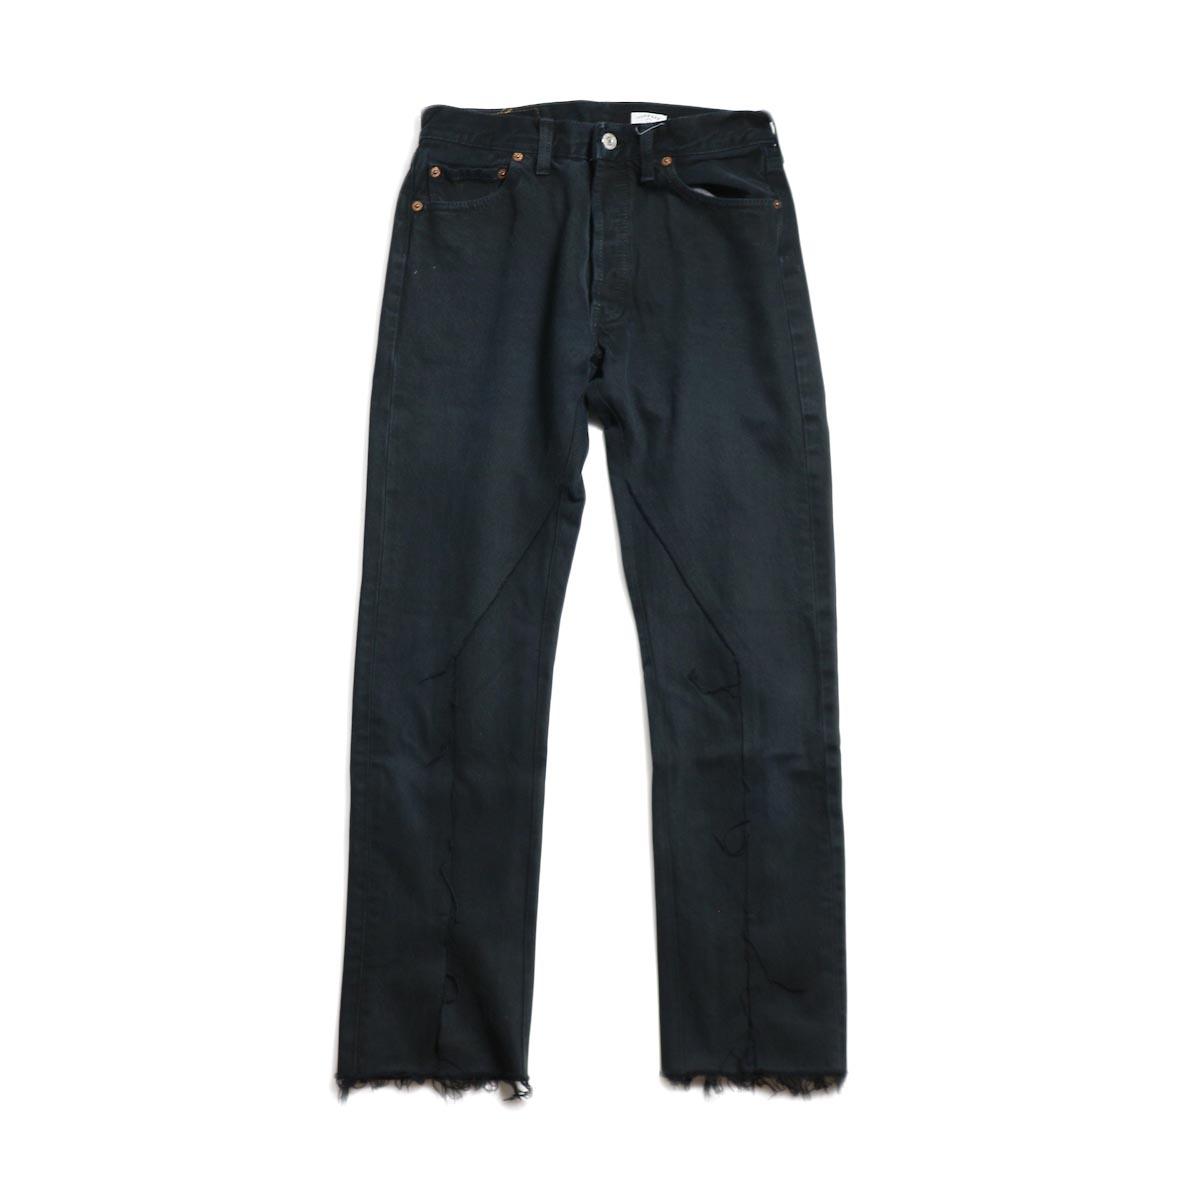 OLD PARK / Slit Jeans -Black Ssize (D)